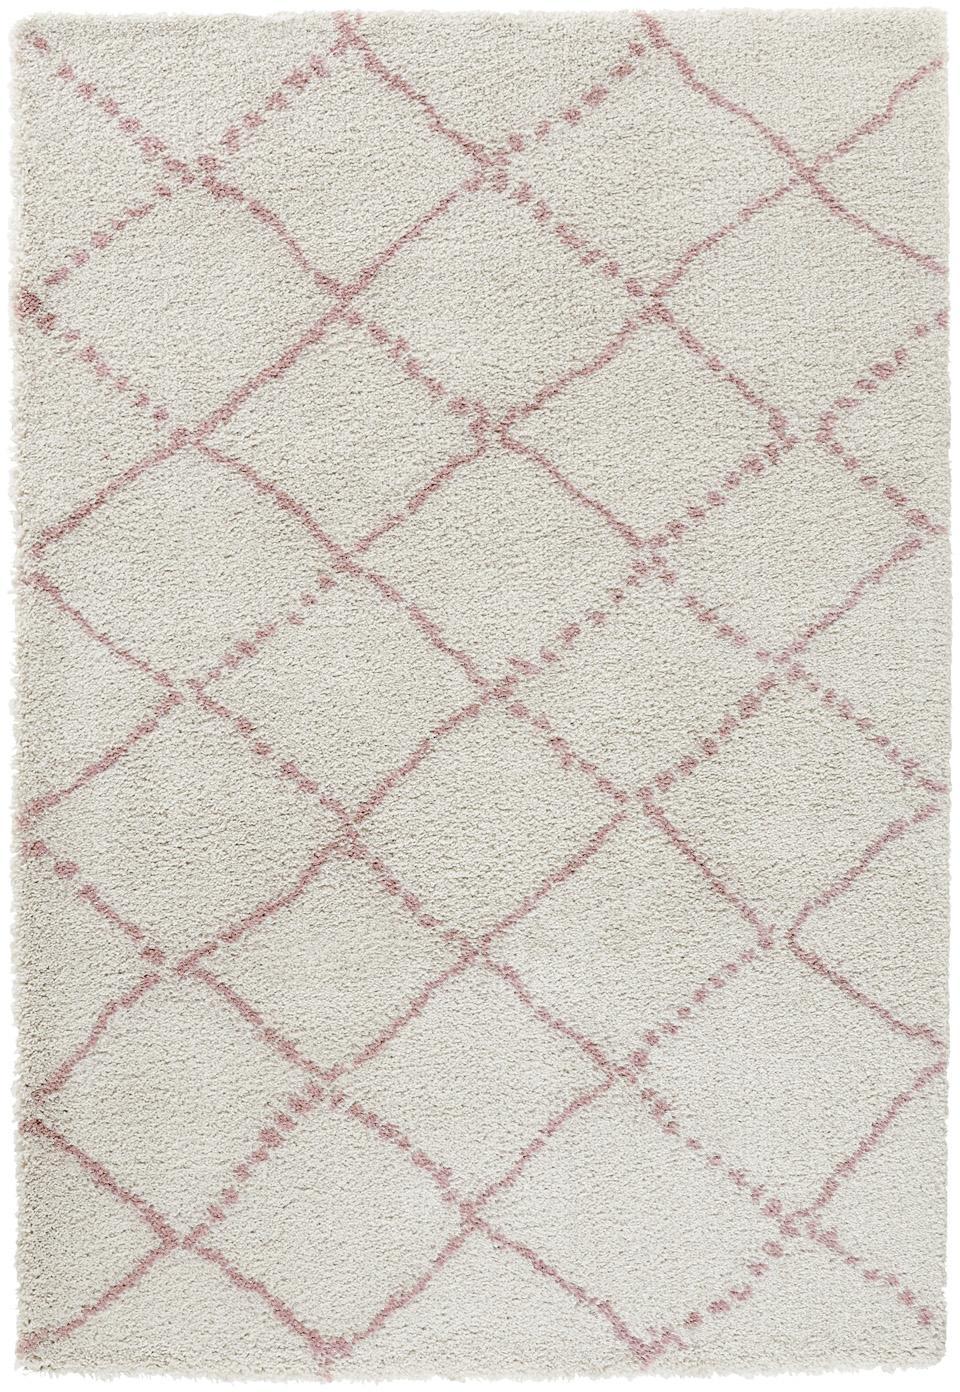 Flauschiger Hochflor-Teppich Hash in Rosa/Creme, Flor: 100% Polypropylen, Cremefarben, Rosa, B 120 x L 170 cm (Grösse S)